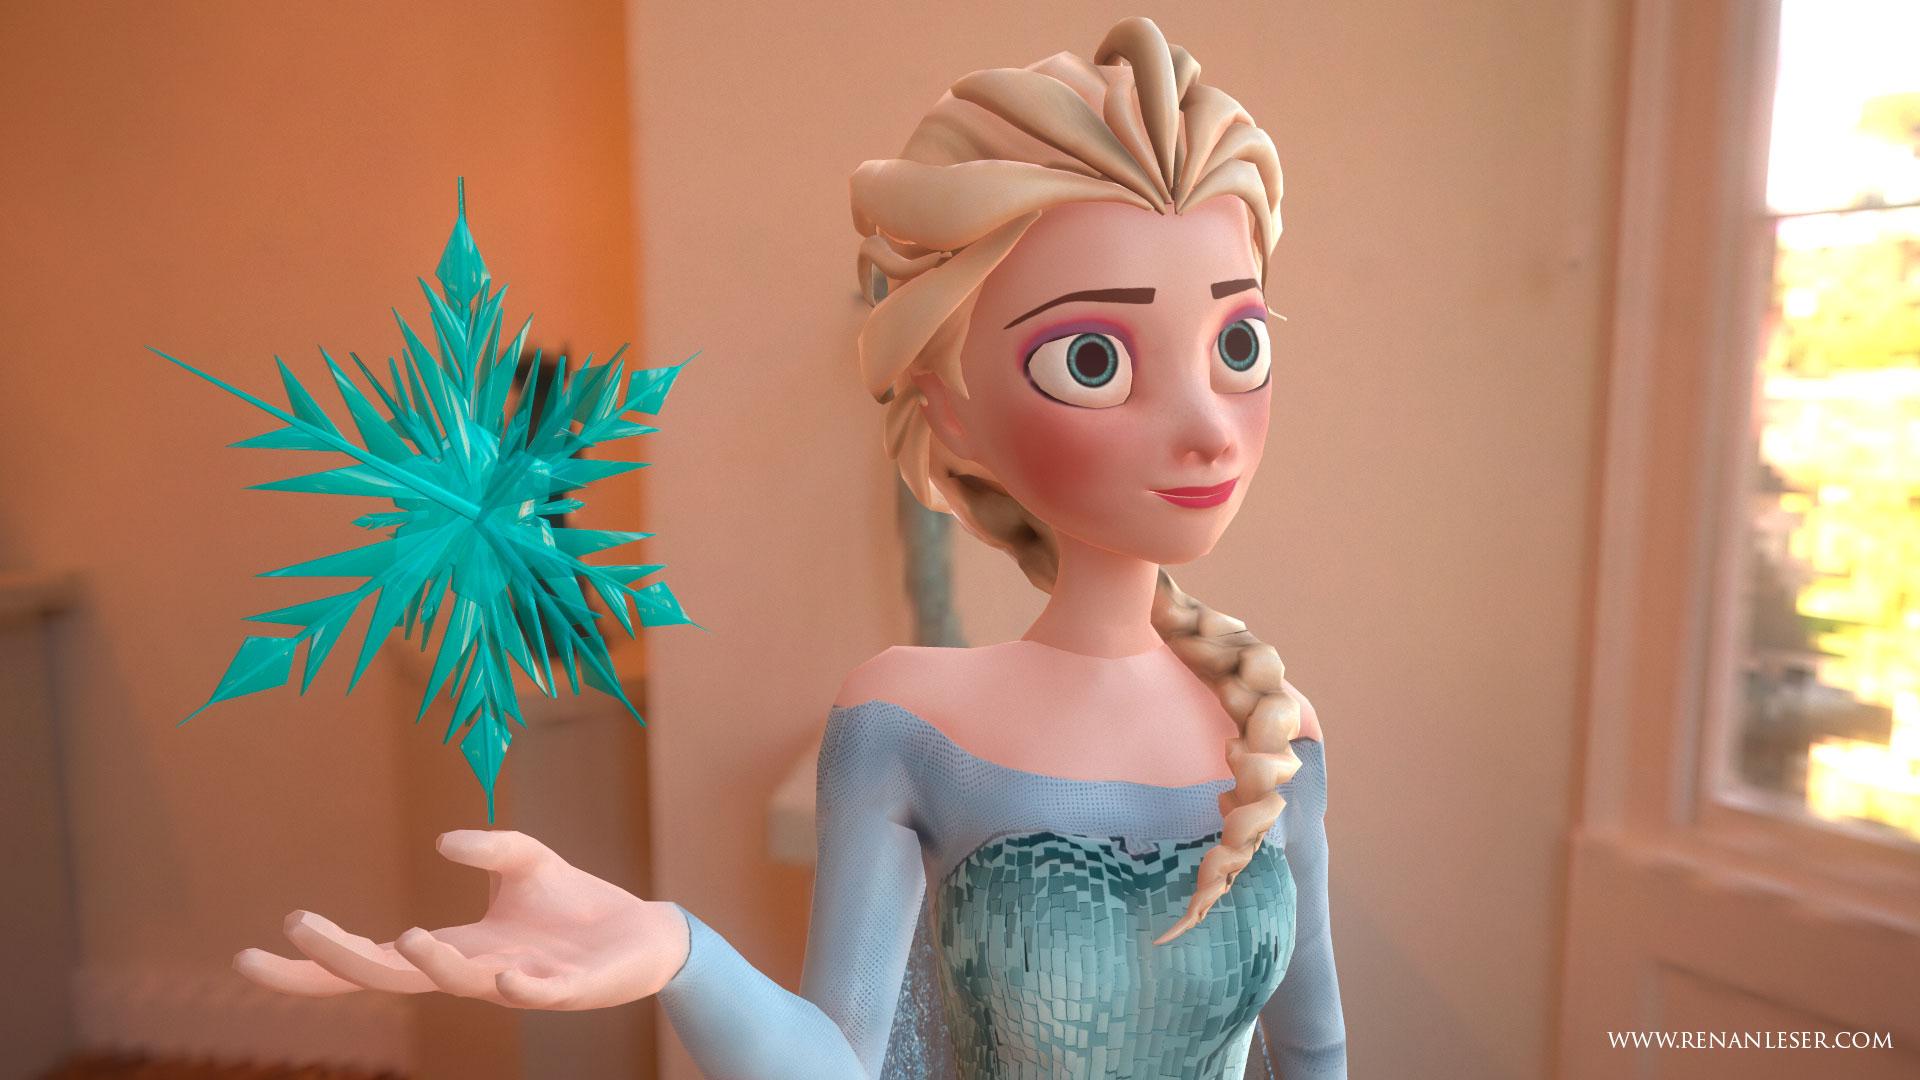 Disney Princess AR App